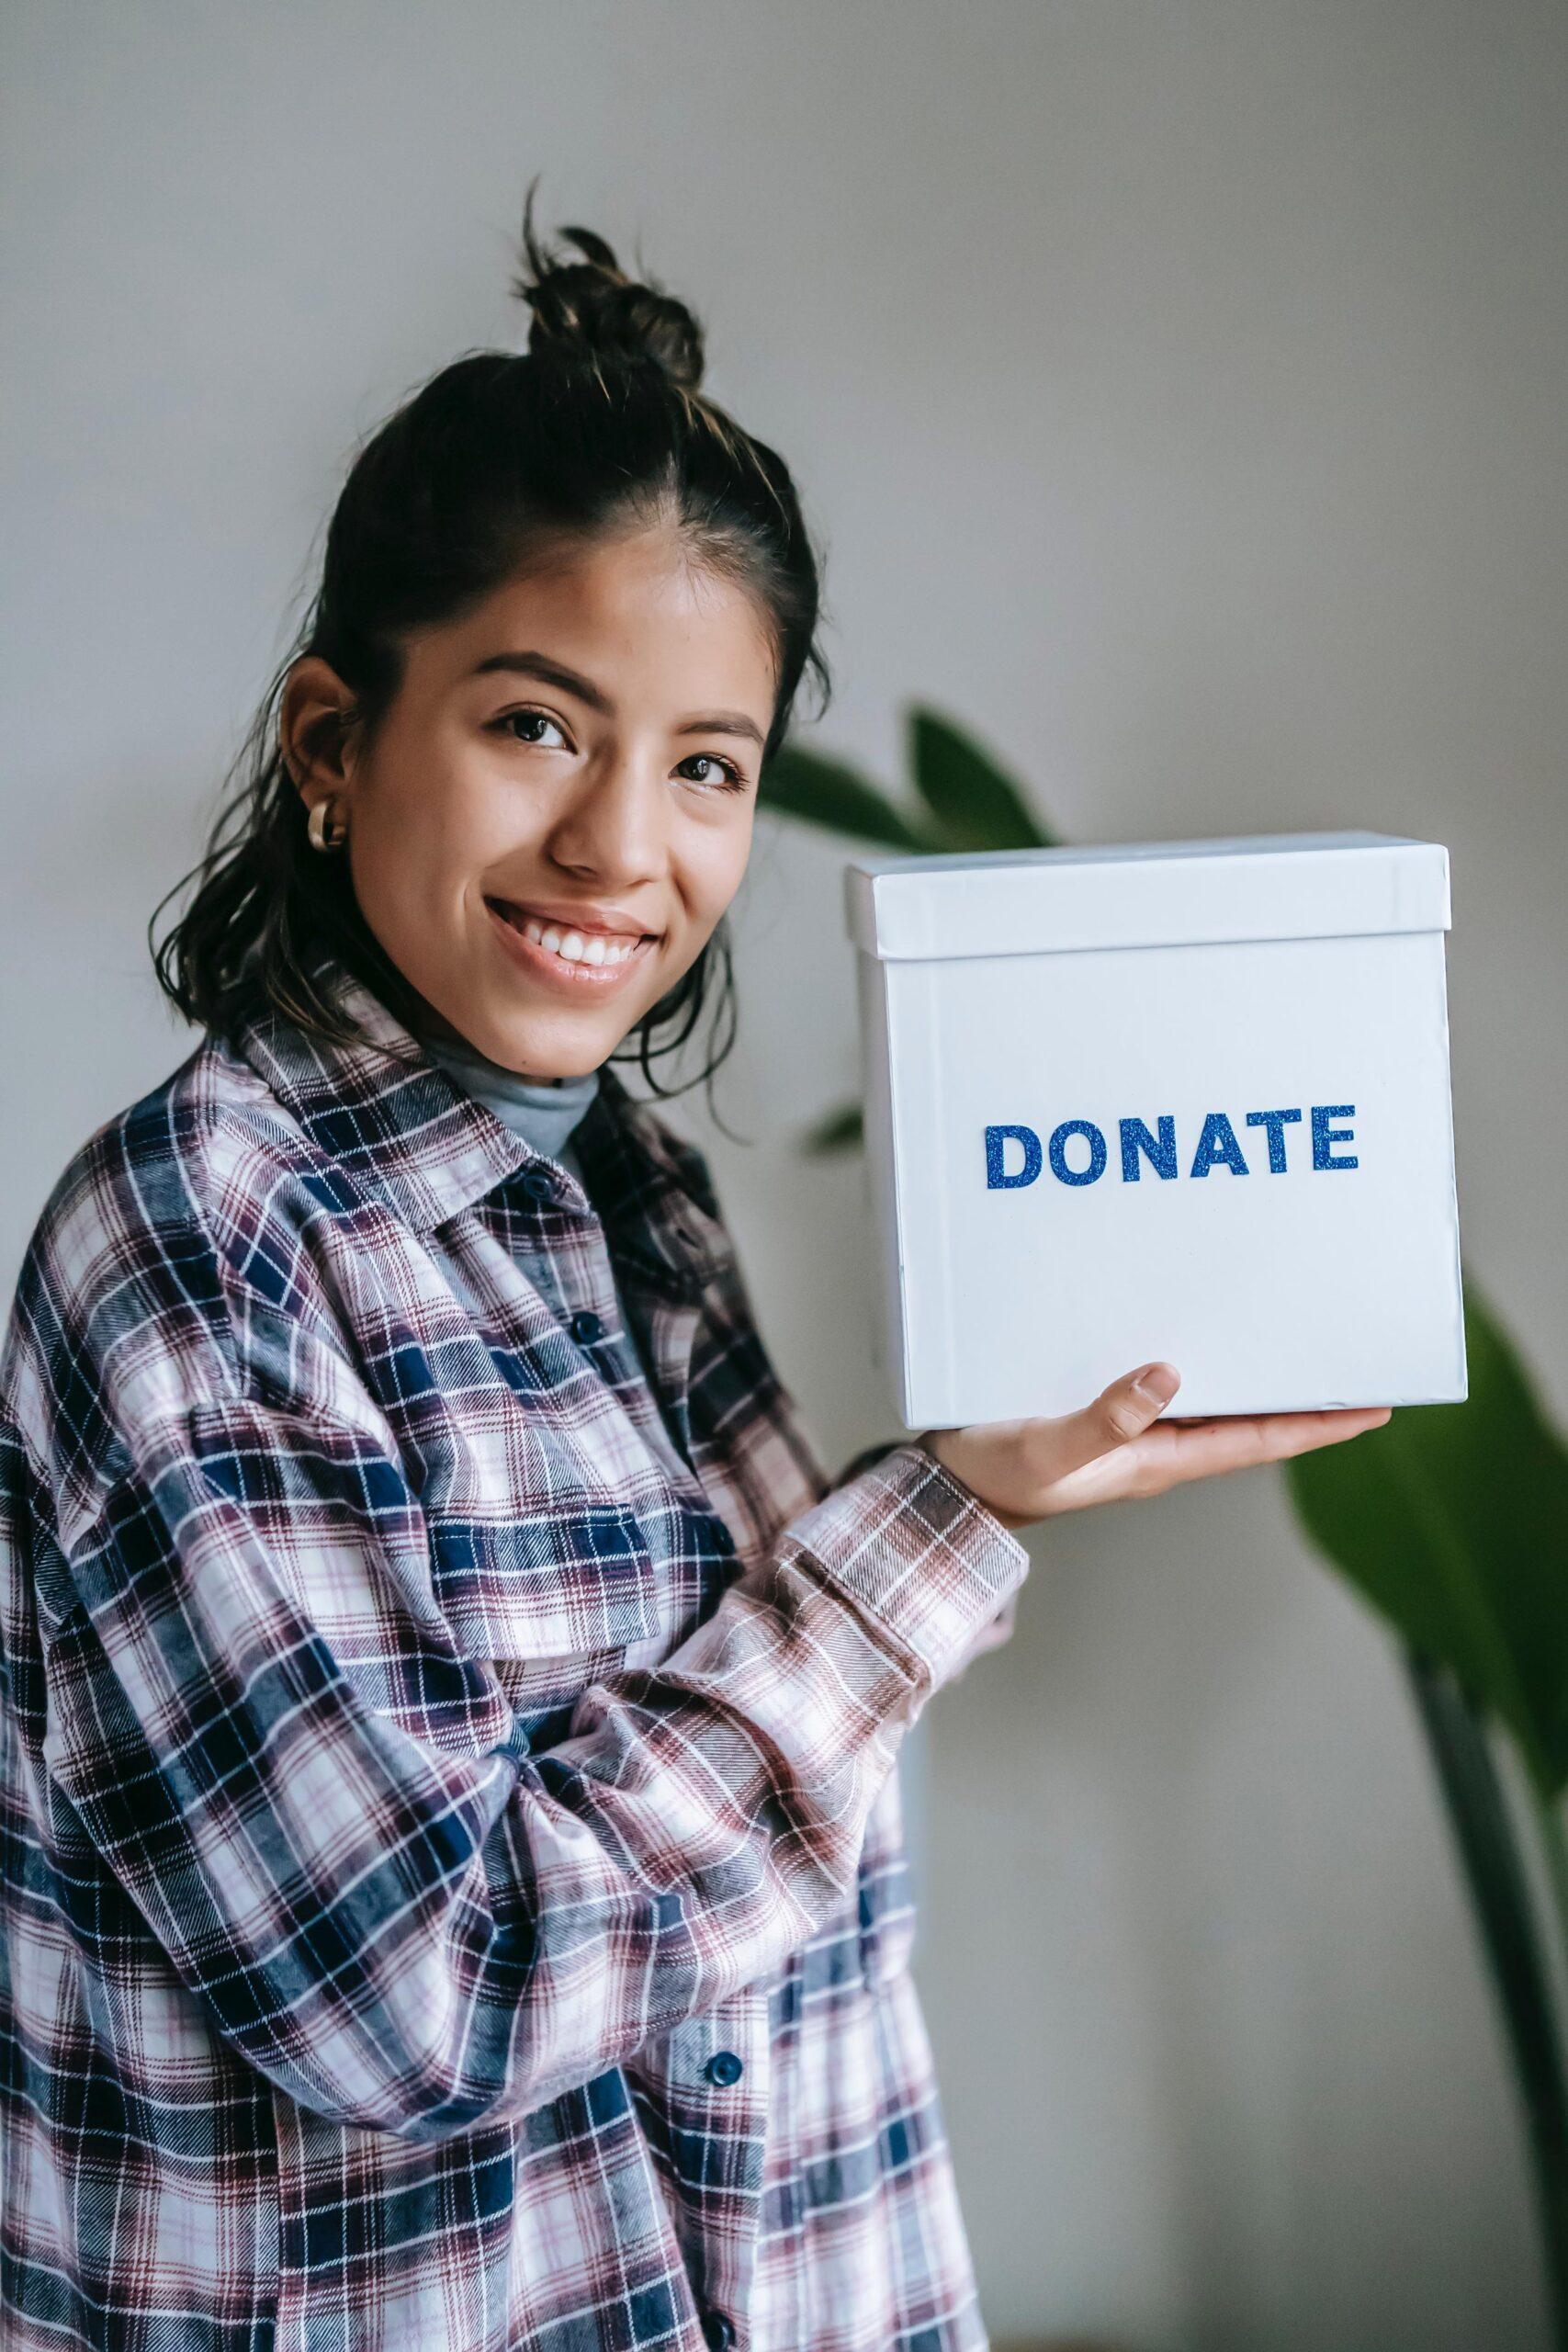 Girl showing donate box